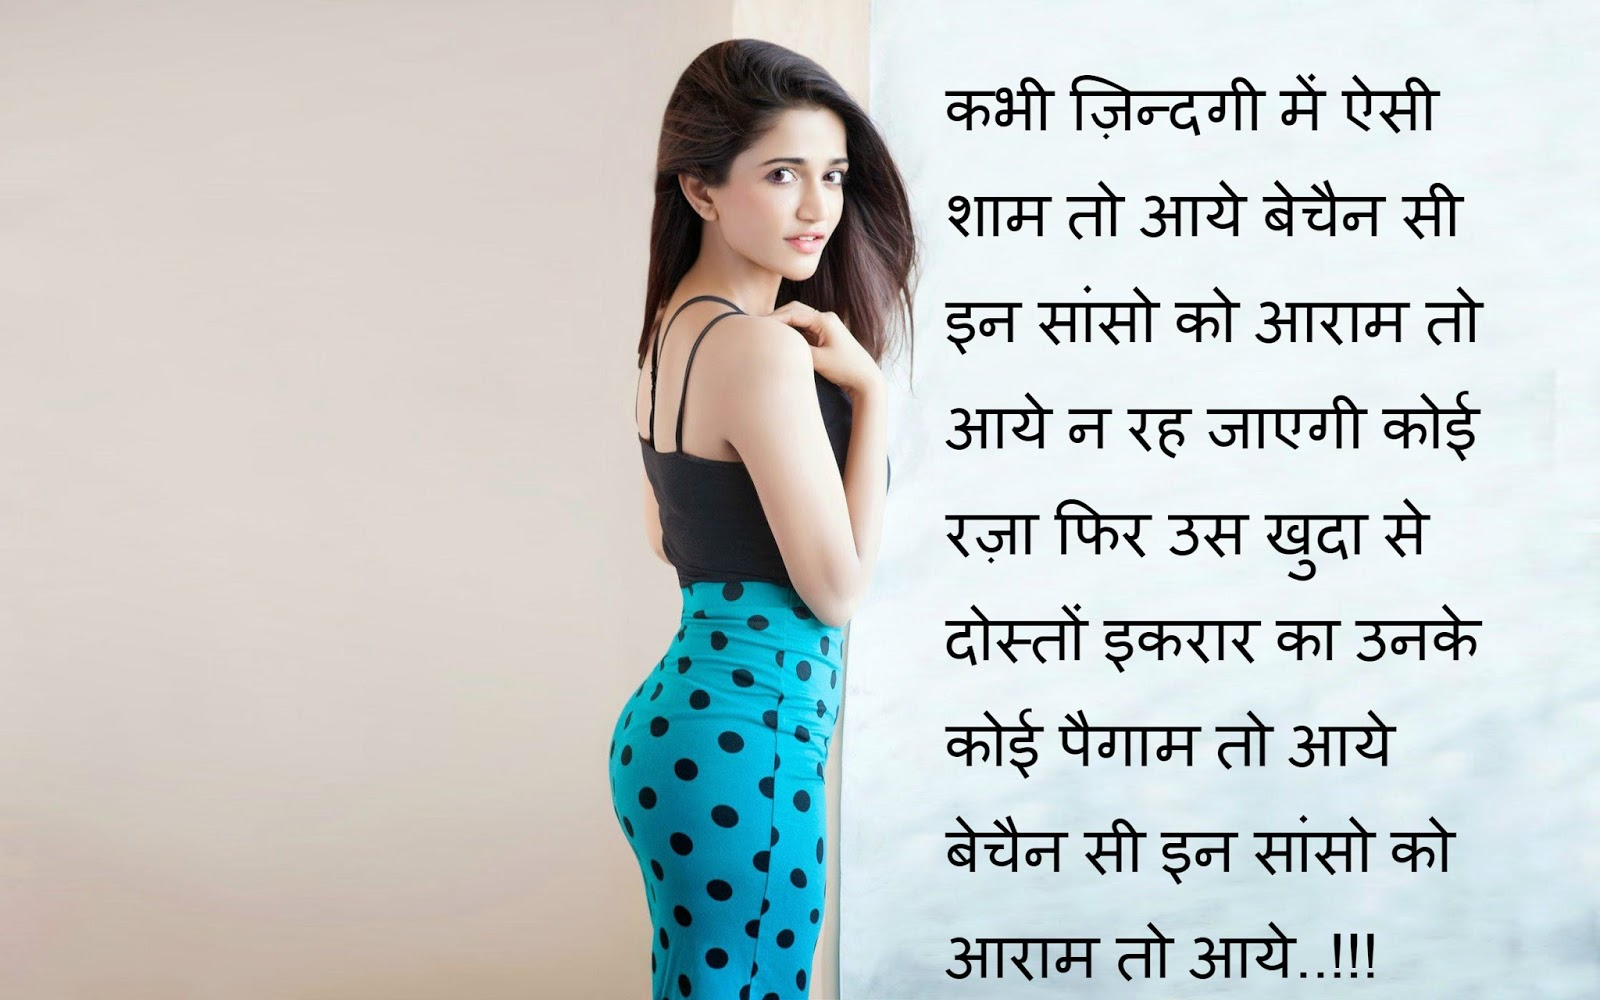 love dating tips in hindi बस ये एक काम करदो लड़की आपके पीछे ही पड़ जाएगी | love tips for men in hindi - duration: 3:34 rambaan solutions 1,775,344.